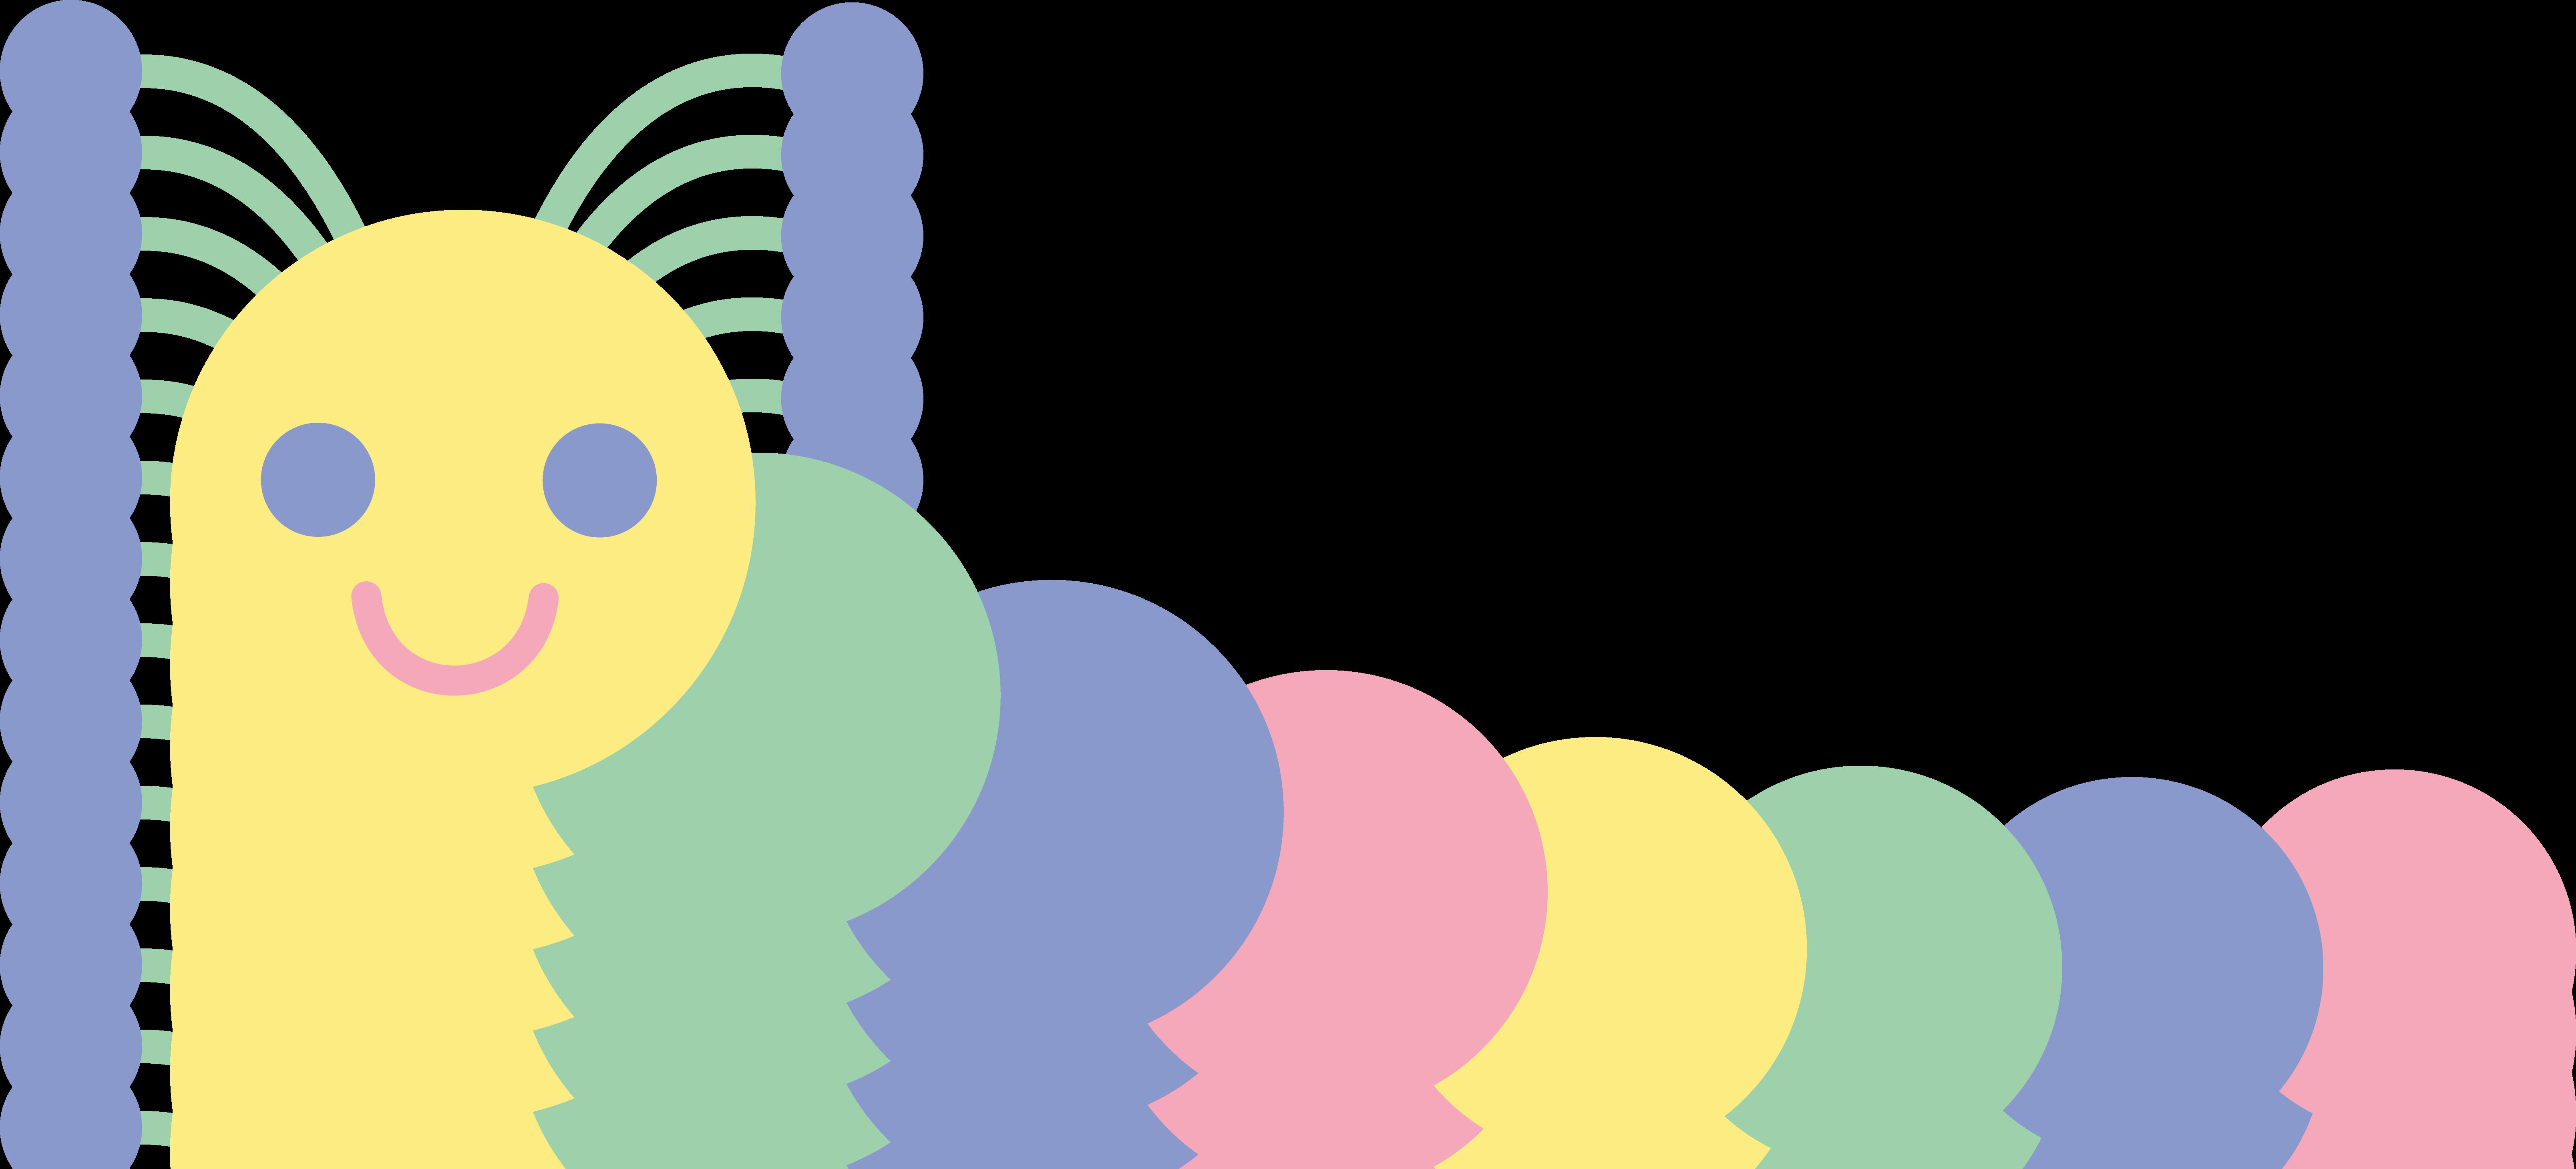 clip art download Caterpillar clipart illustration. Cute pastel free clip.